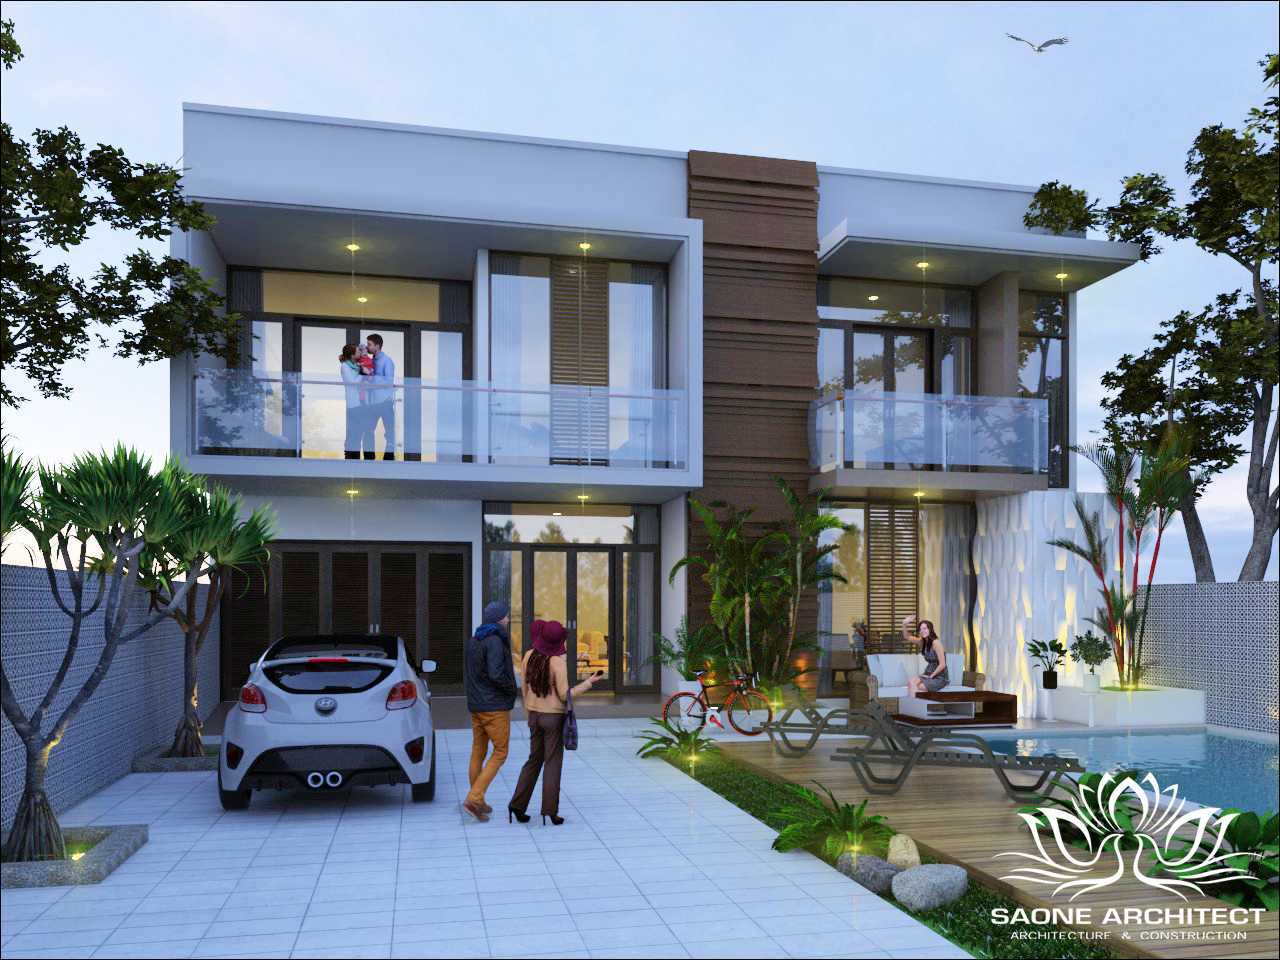 Saone Architect Private Villa Jimbaran Bali Jimbaran, Kuta Sel., Kabupaten Badung, Bali, Indonesia Jimbaran, Kuta Sel., Kabupaten Badung, Bali, Indonesia Exterior View Tropis  49724